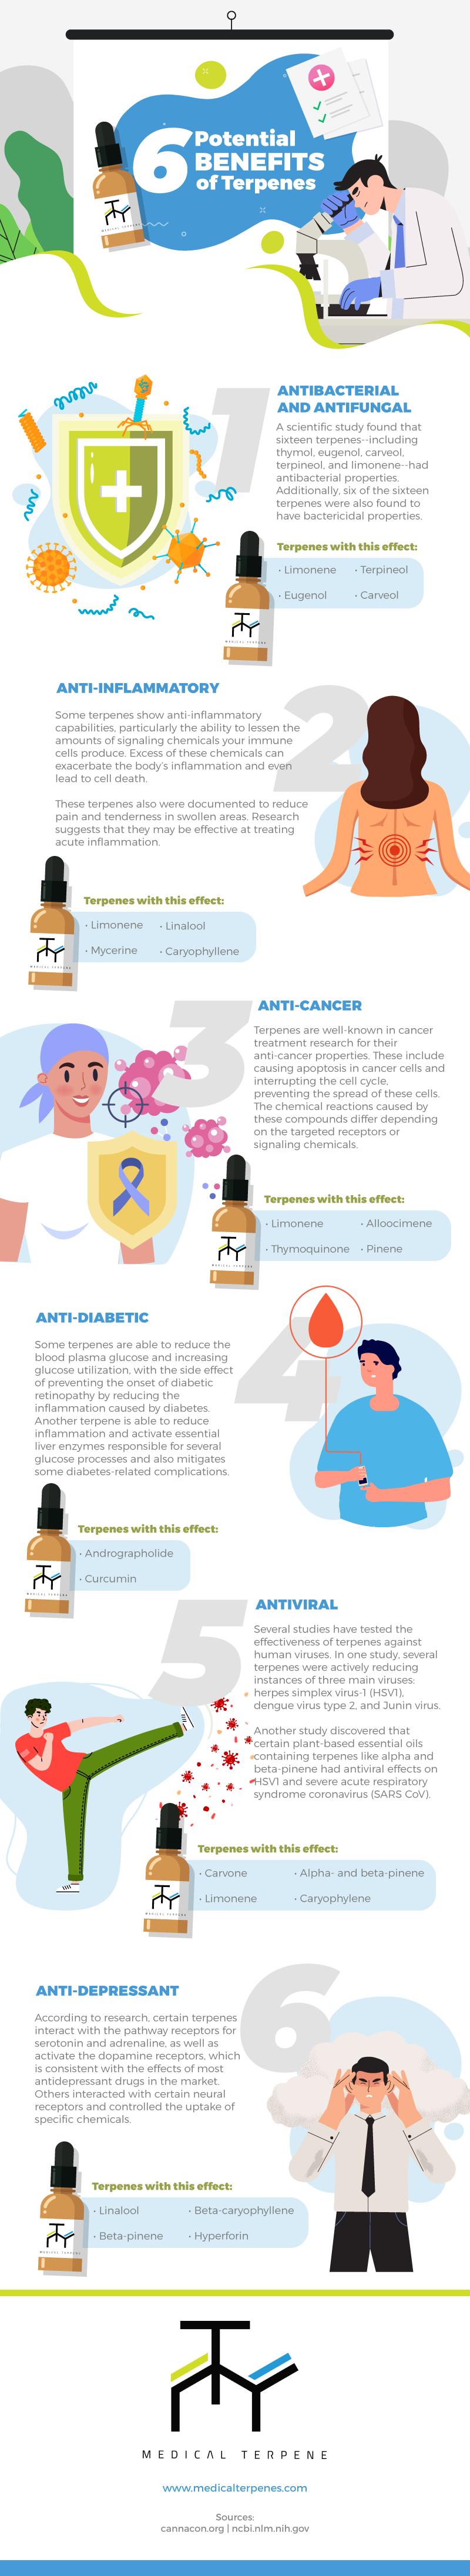 Potential Benefits of Terpenes - Infographic